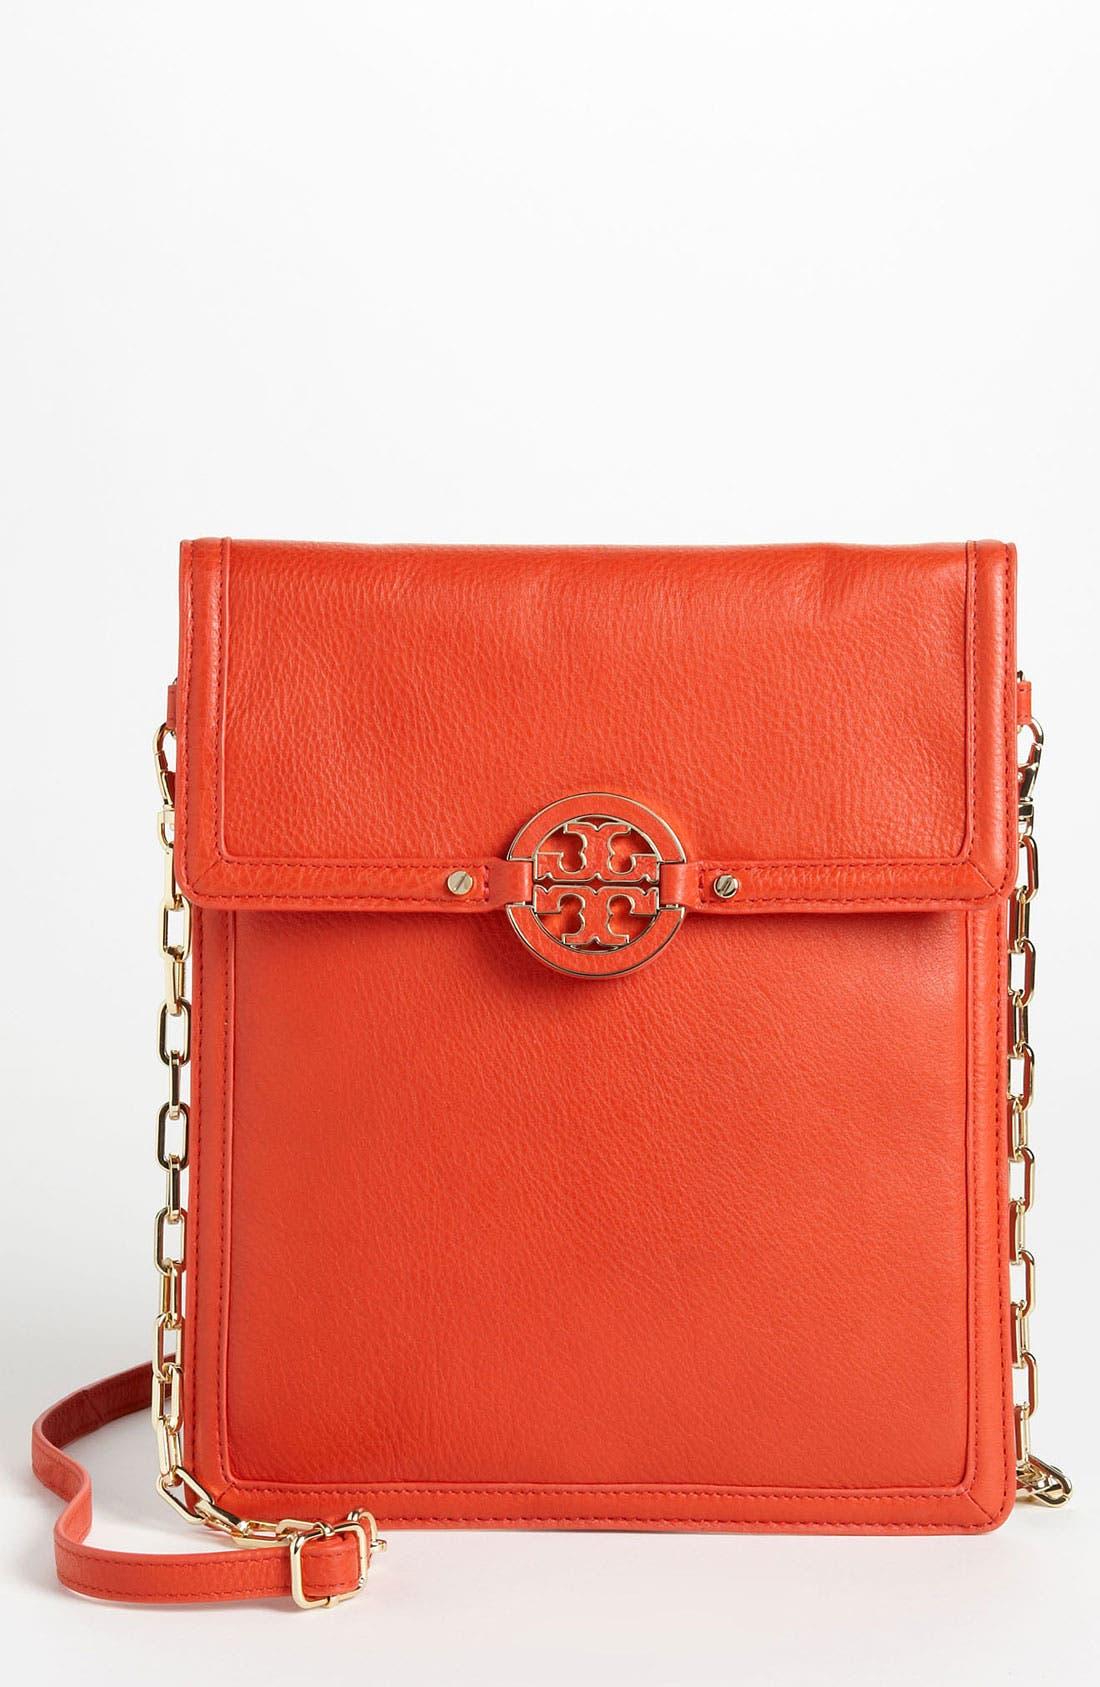 Main Image - Tory Burch 'Amanda' Tablet Sleeve